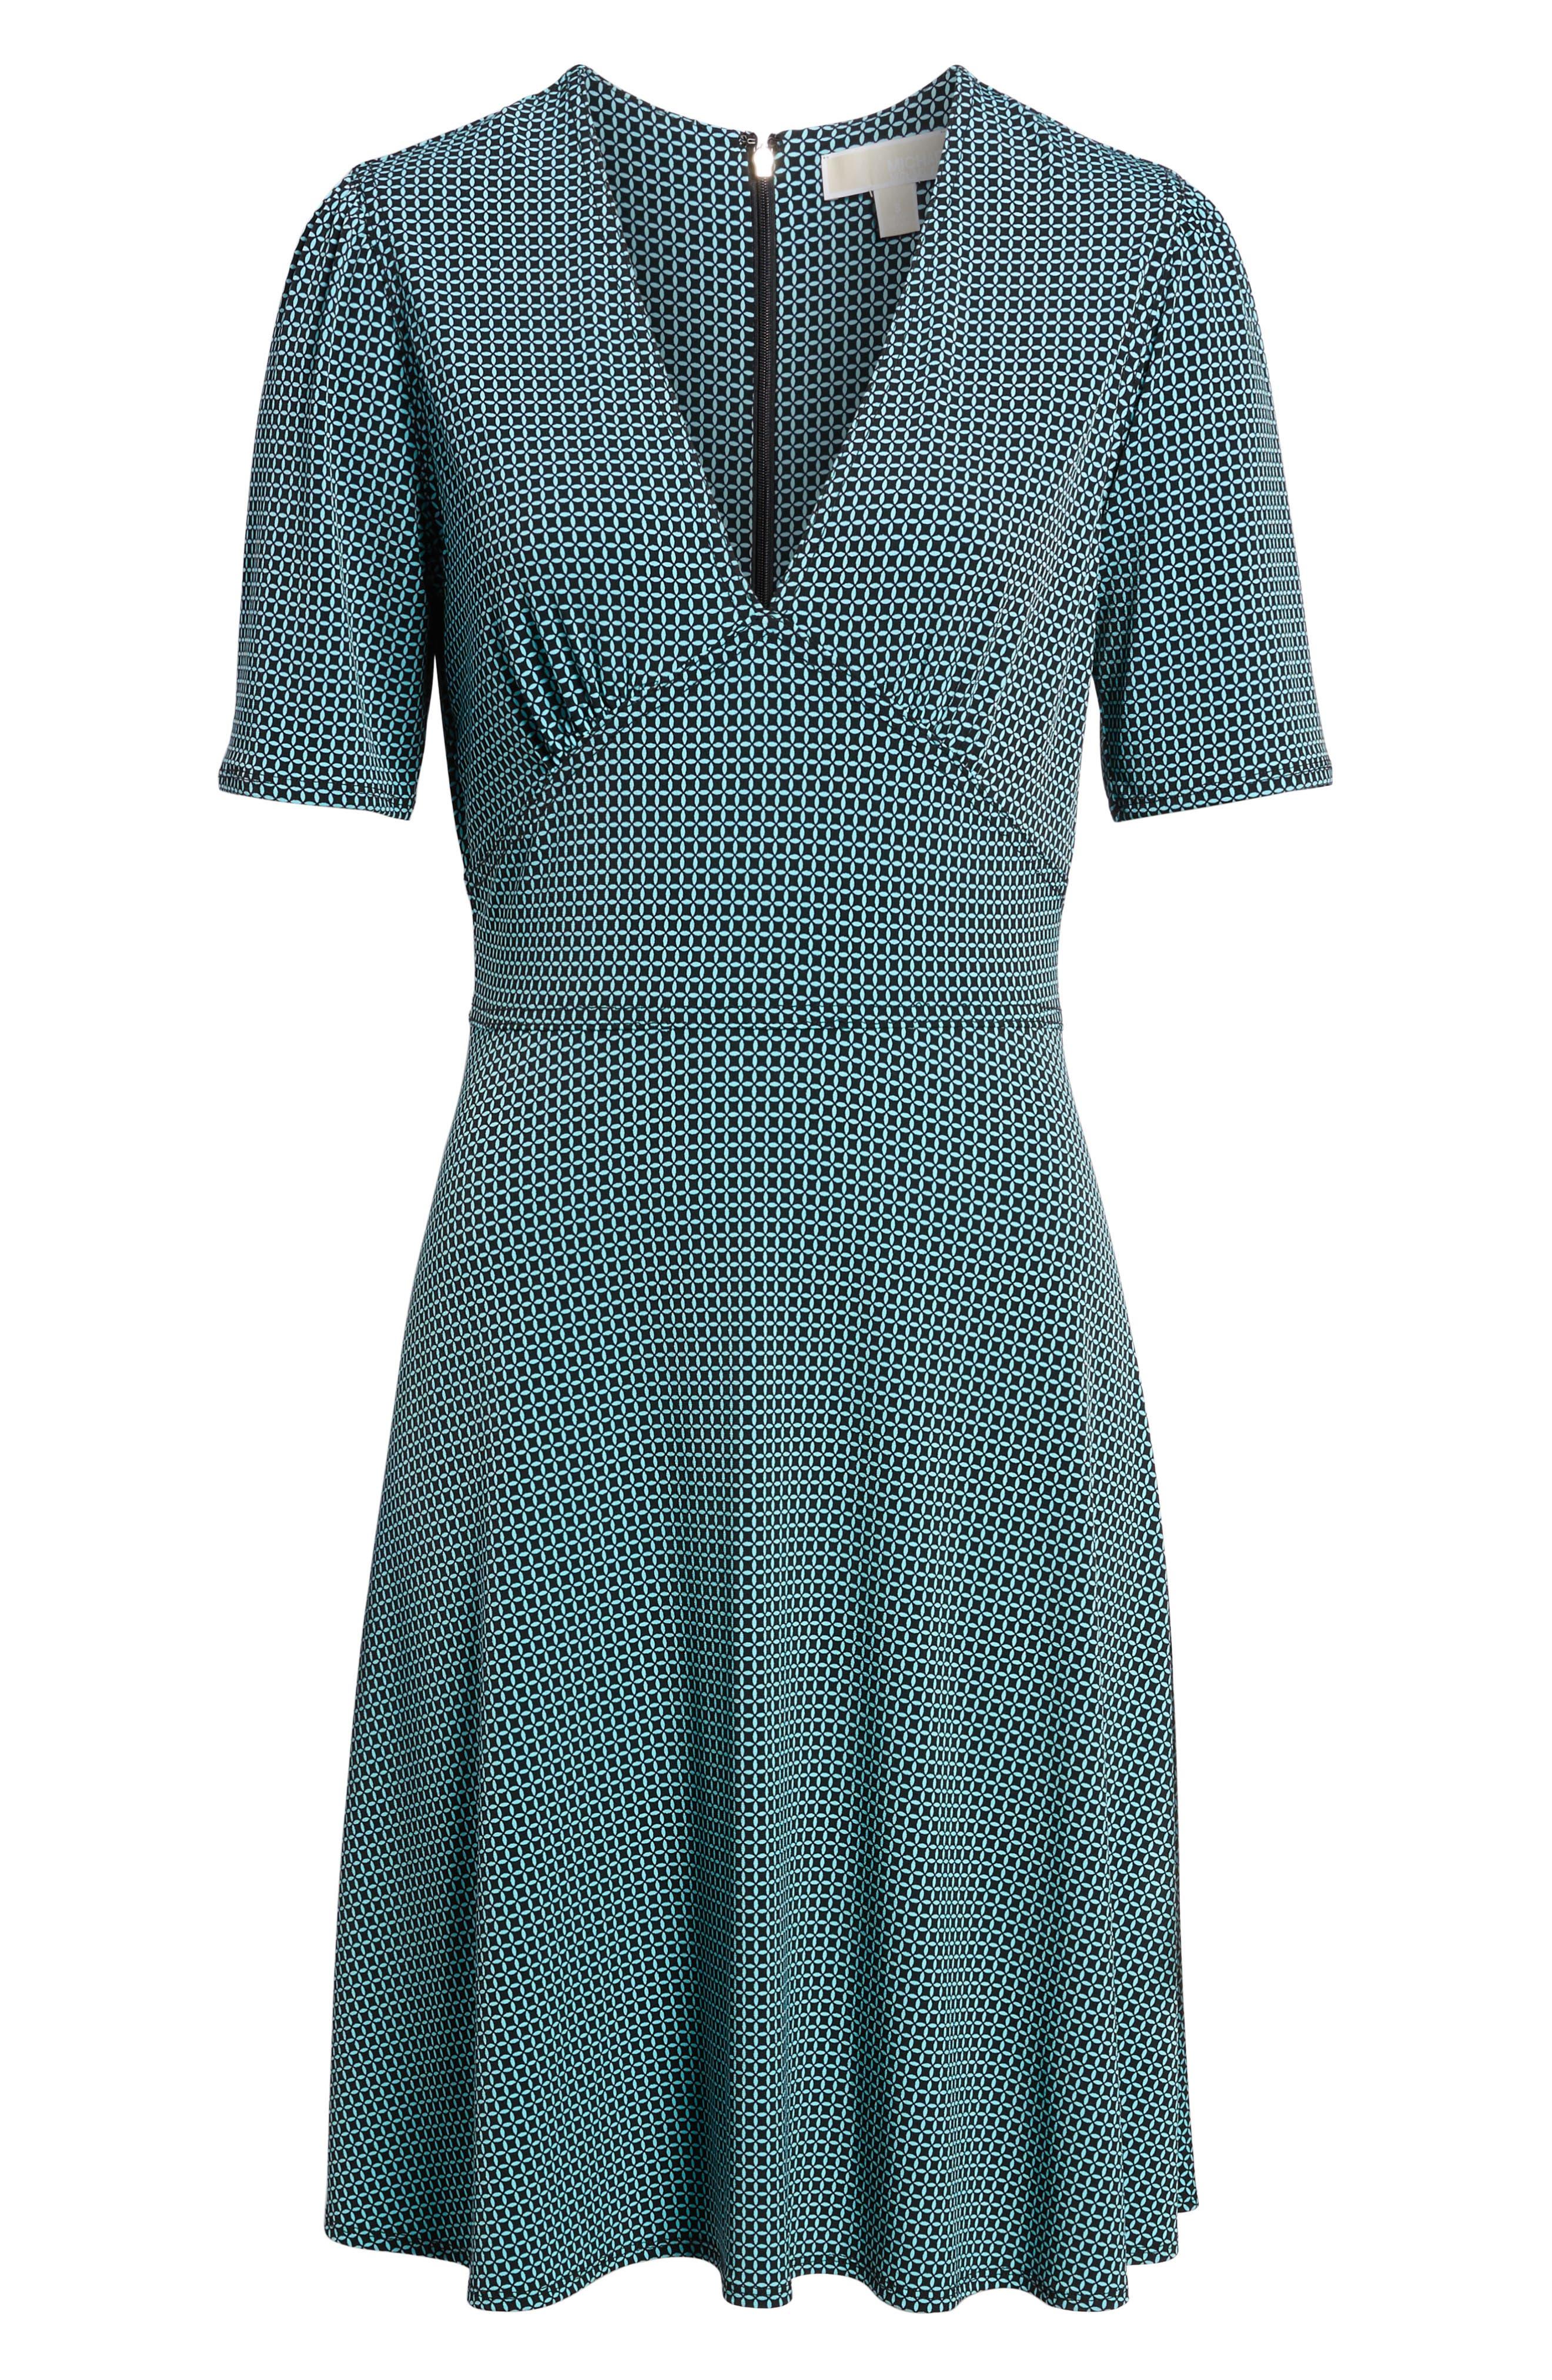 Mod Geo Fit & Flare Dress,                             Alternate thumbnail 6, color,                             Turquoise/ Black